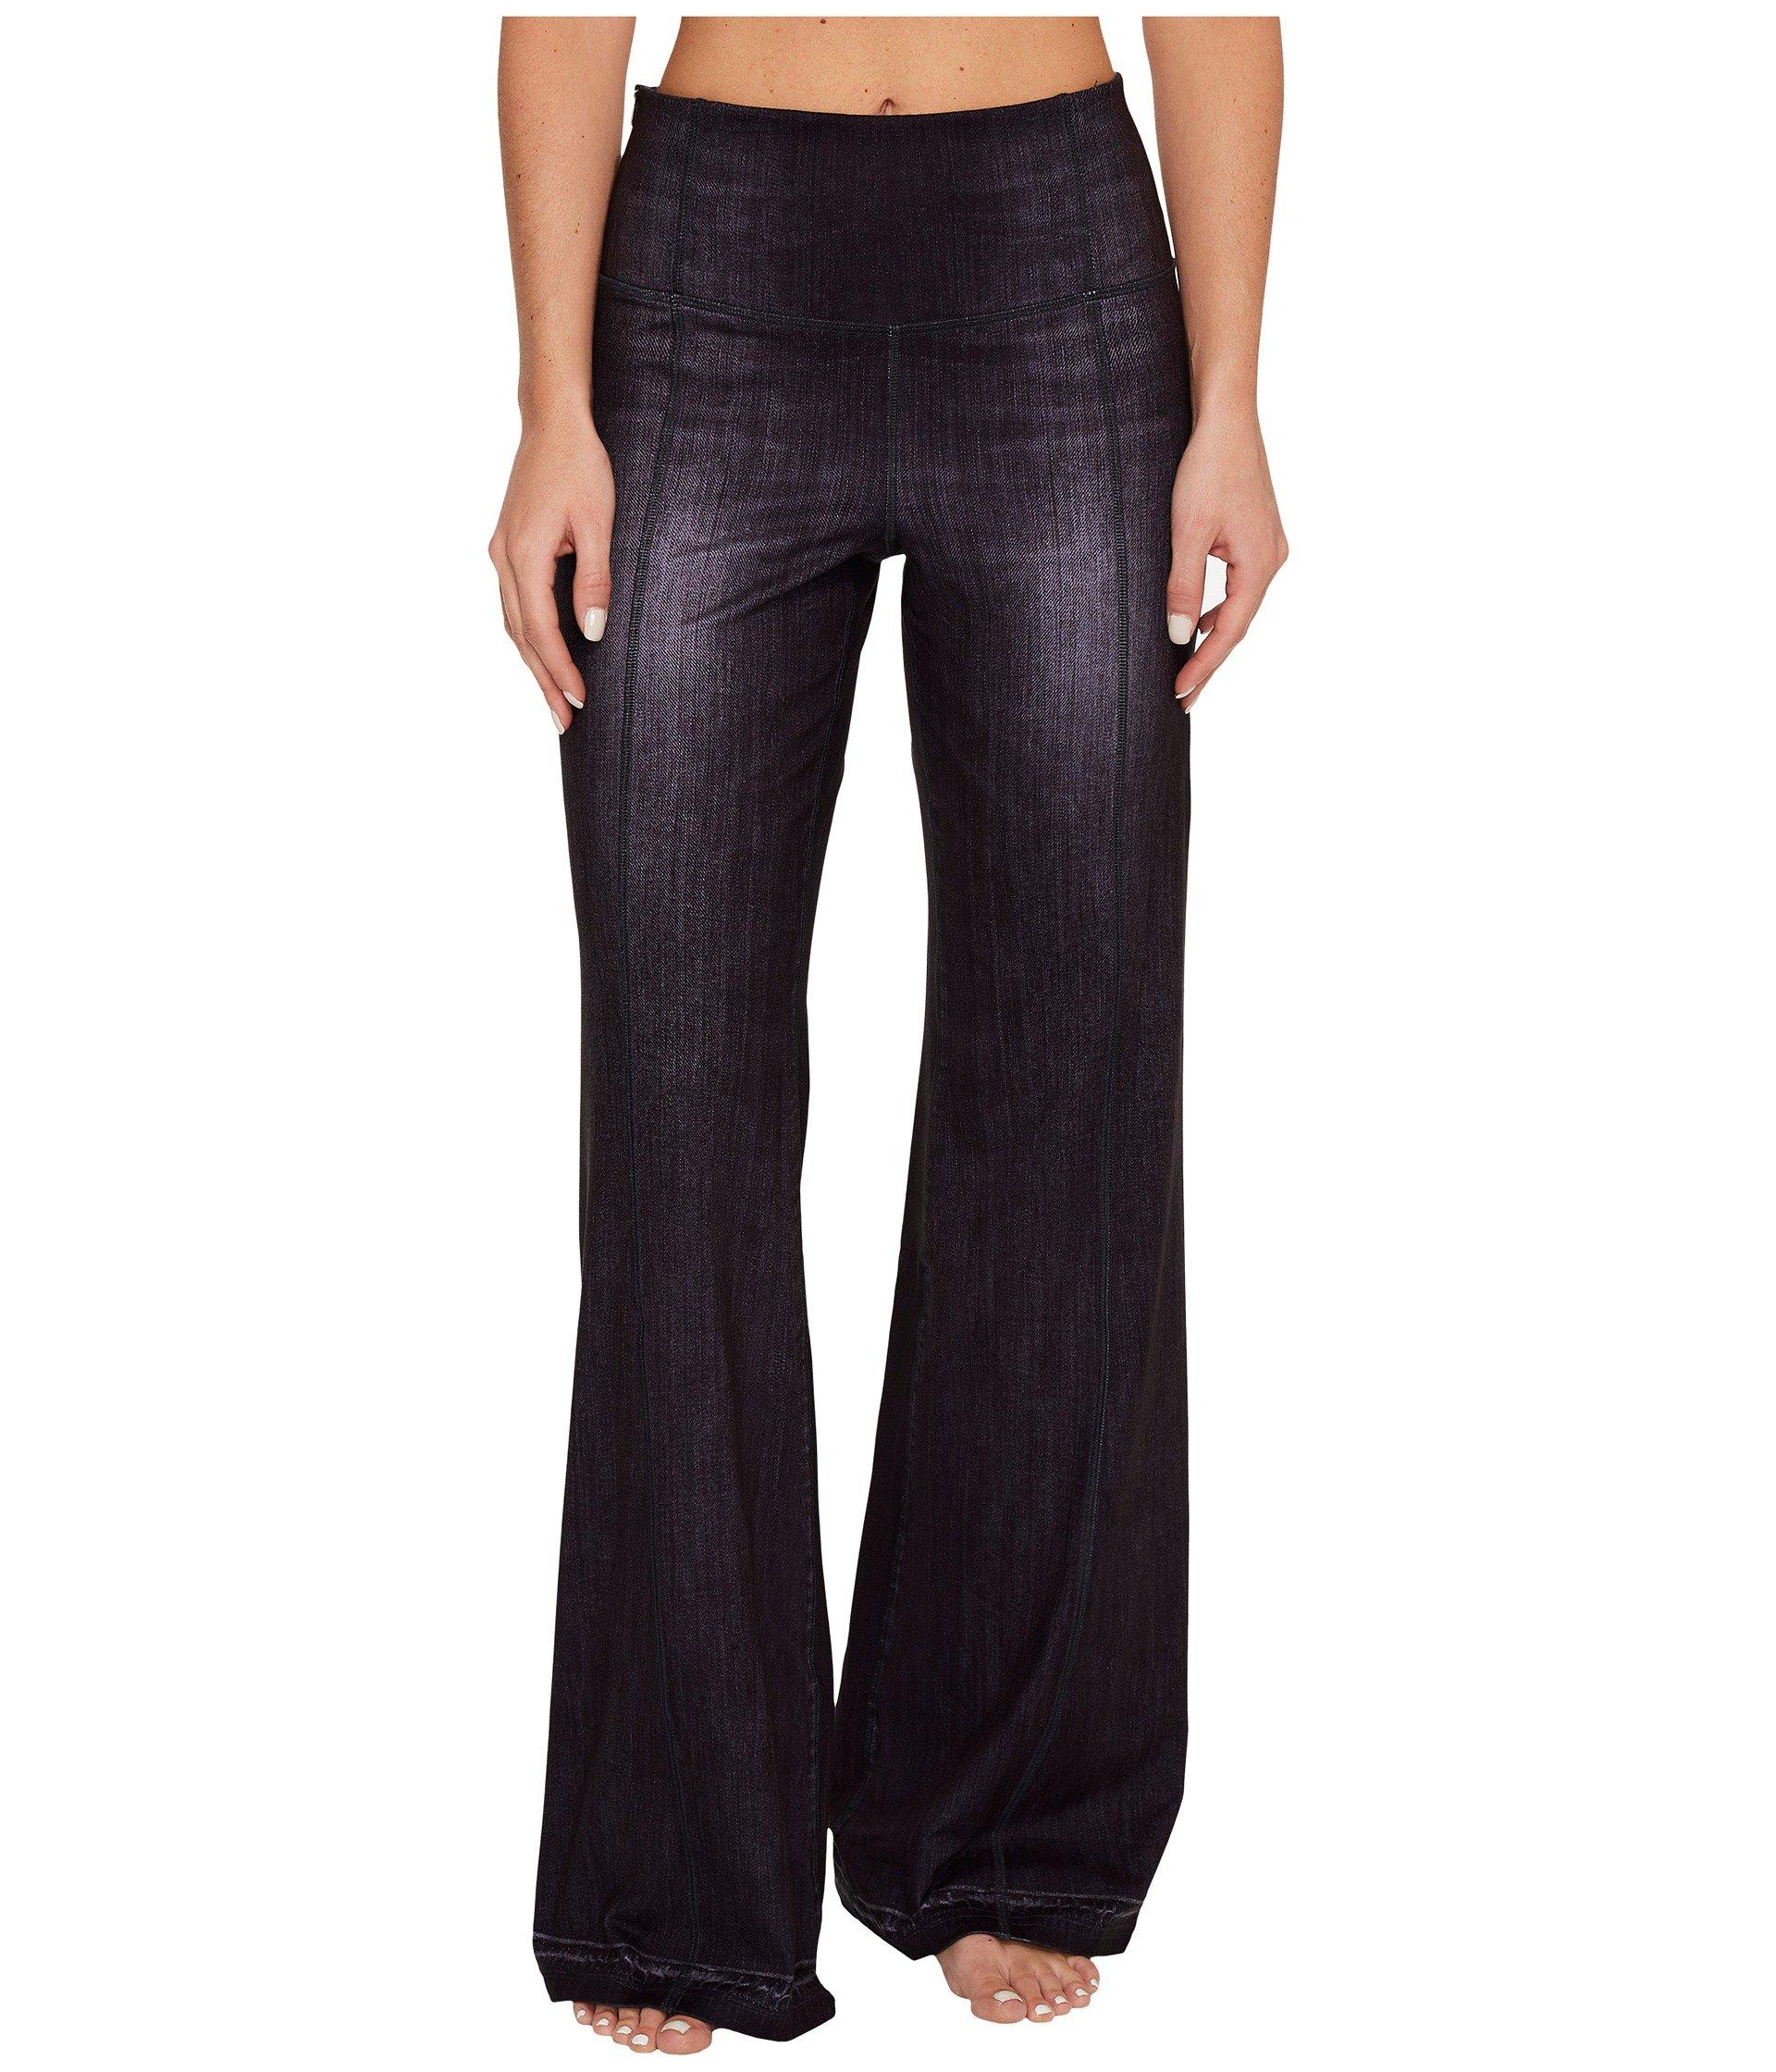 Lucy Women's Indigo Flare Pants Black Indigo Pants by Lucy